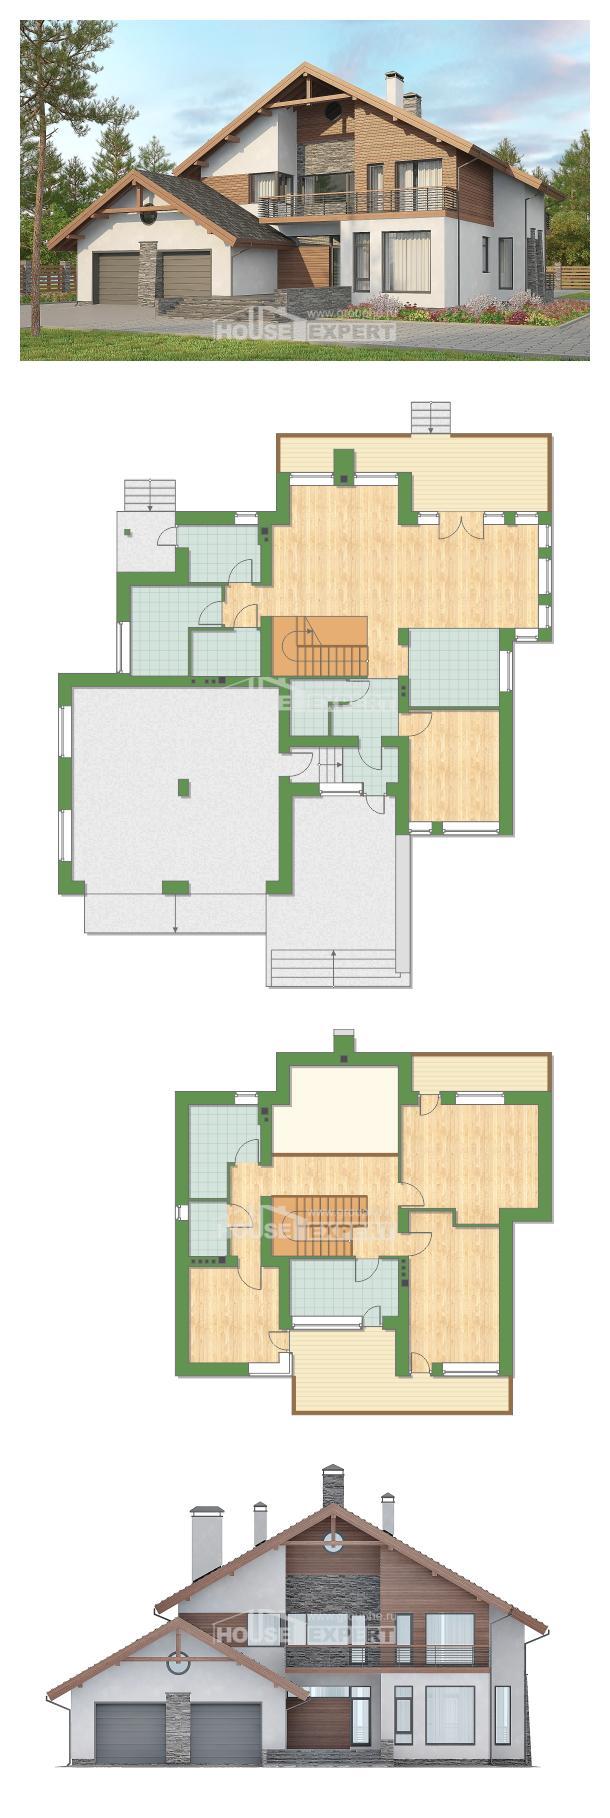 Proyecto de casa 270-003-L   House Expert